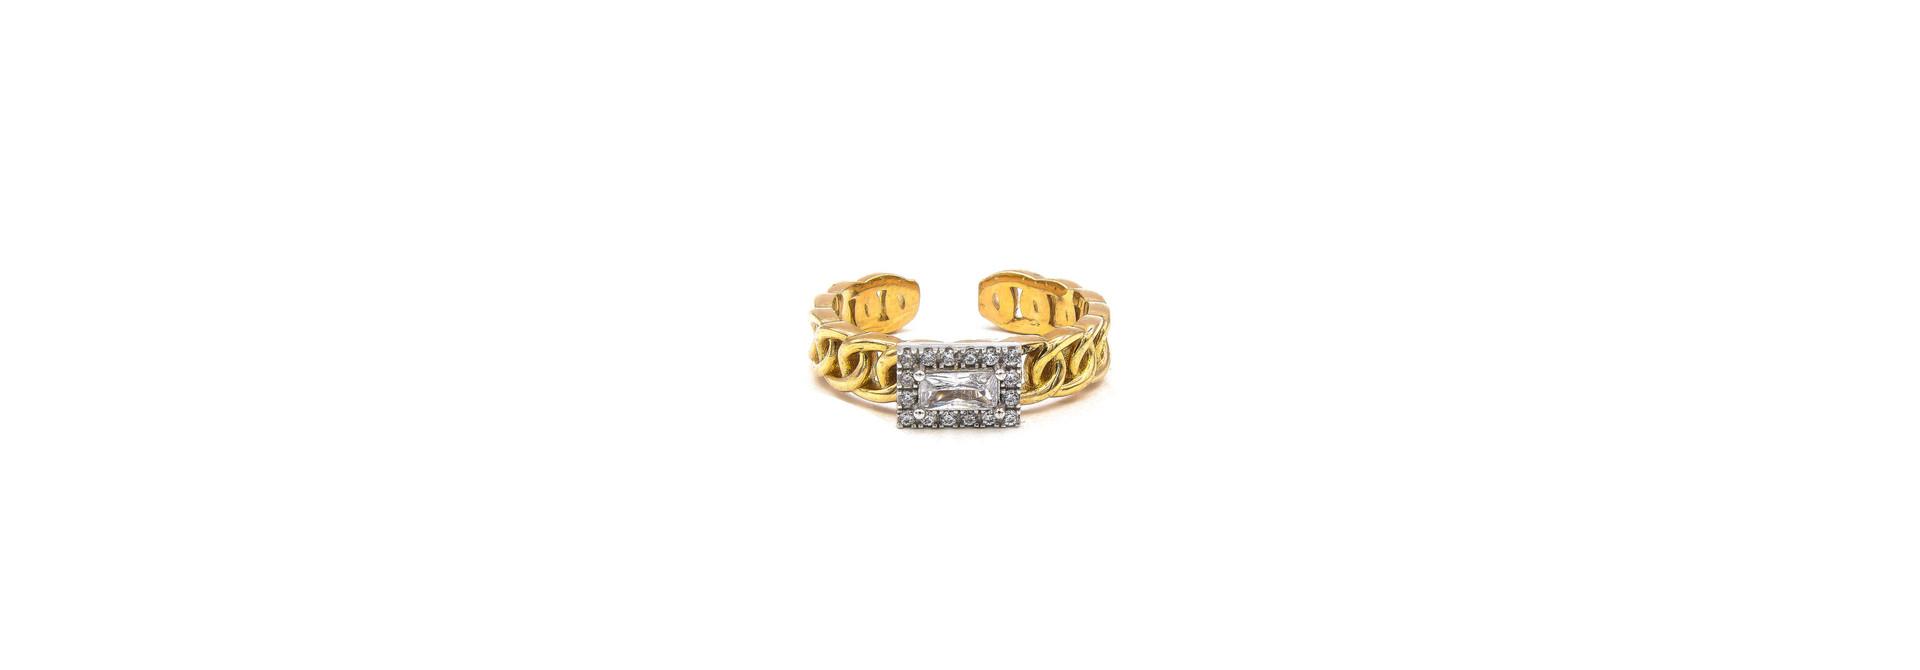 Ring rose schakel met vierkante witte steen bicolor